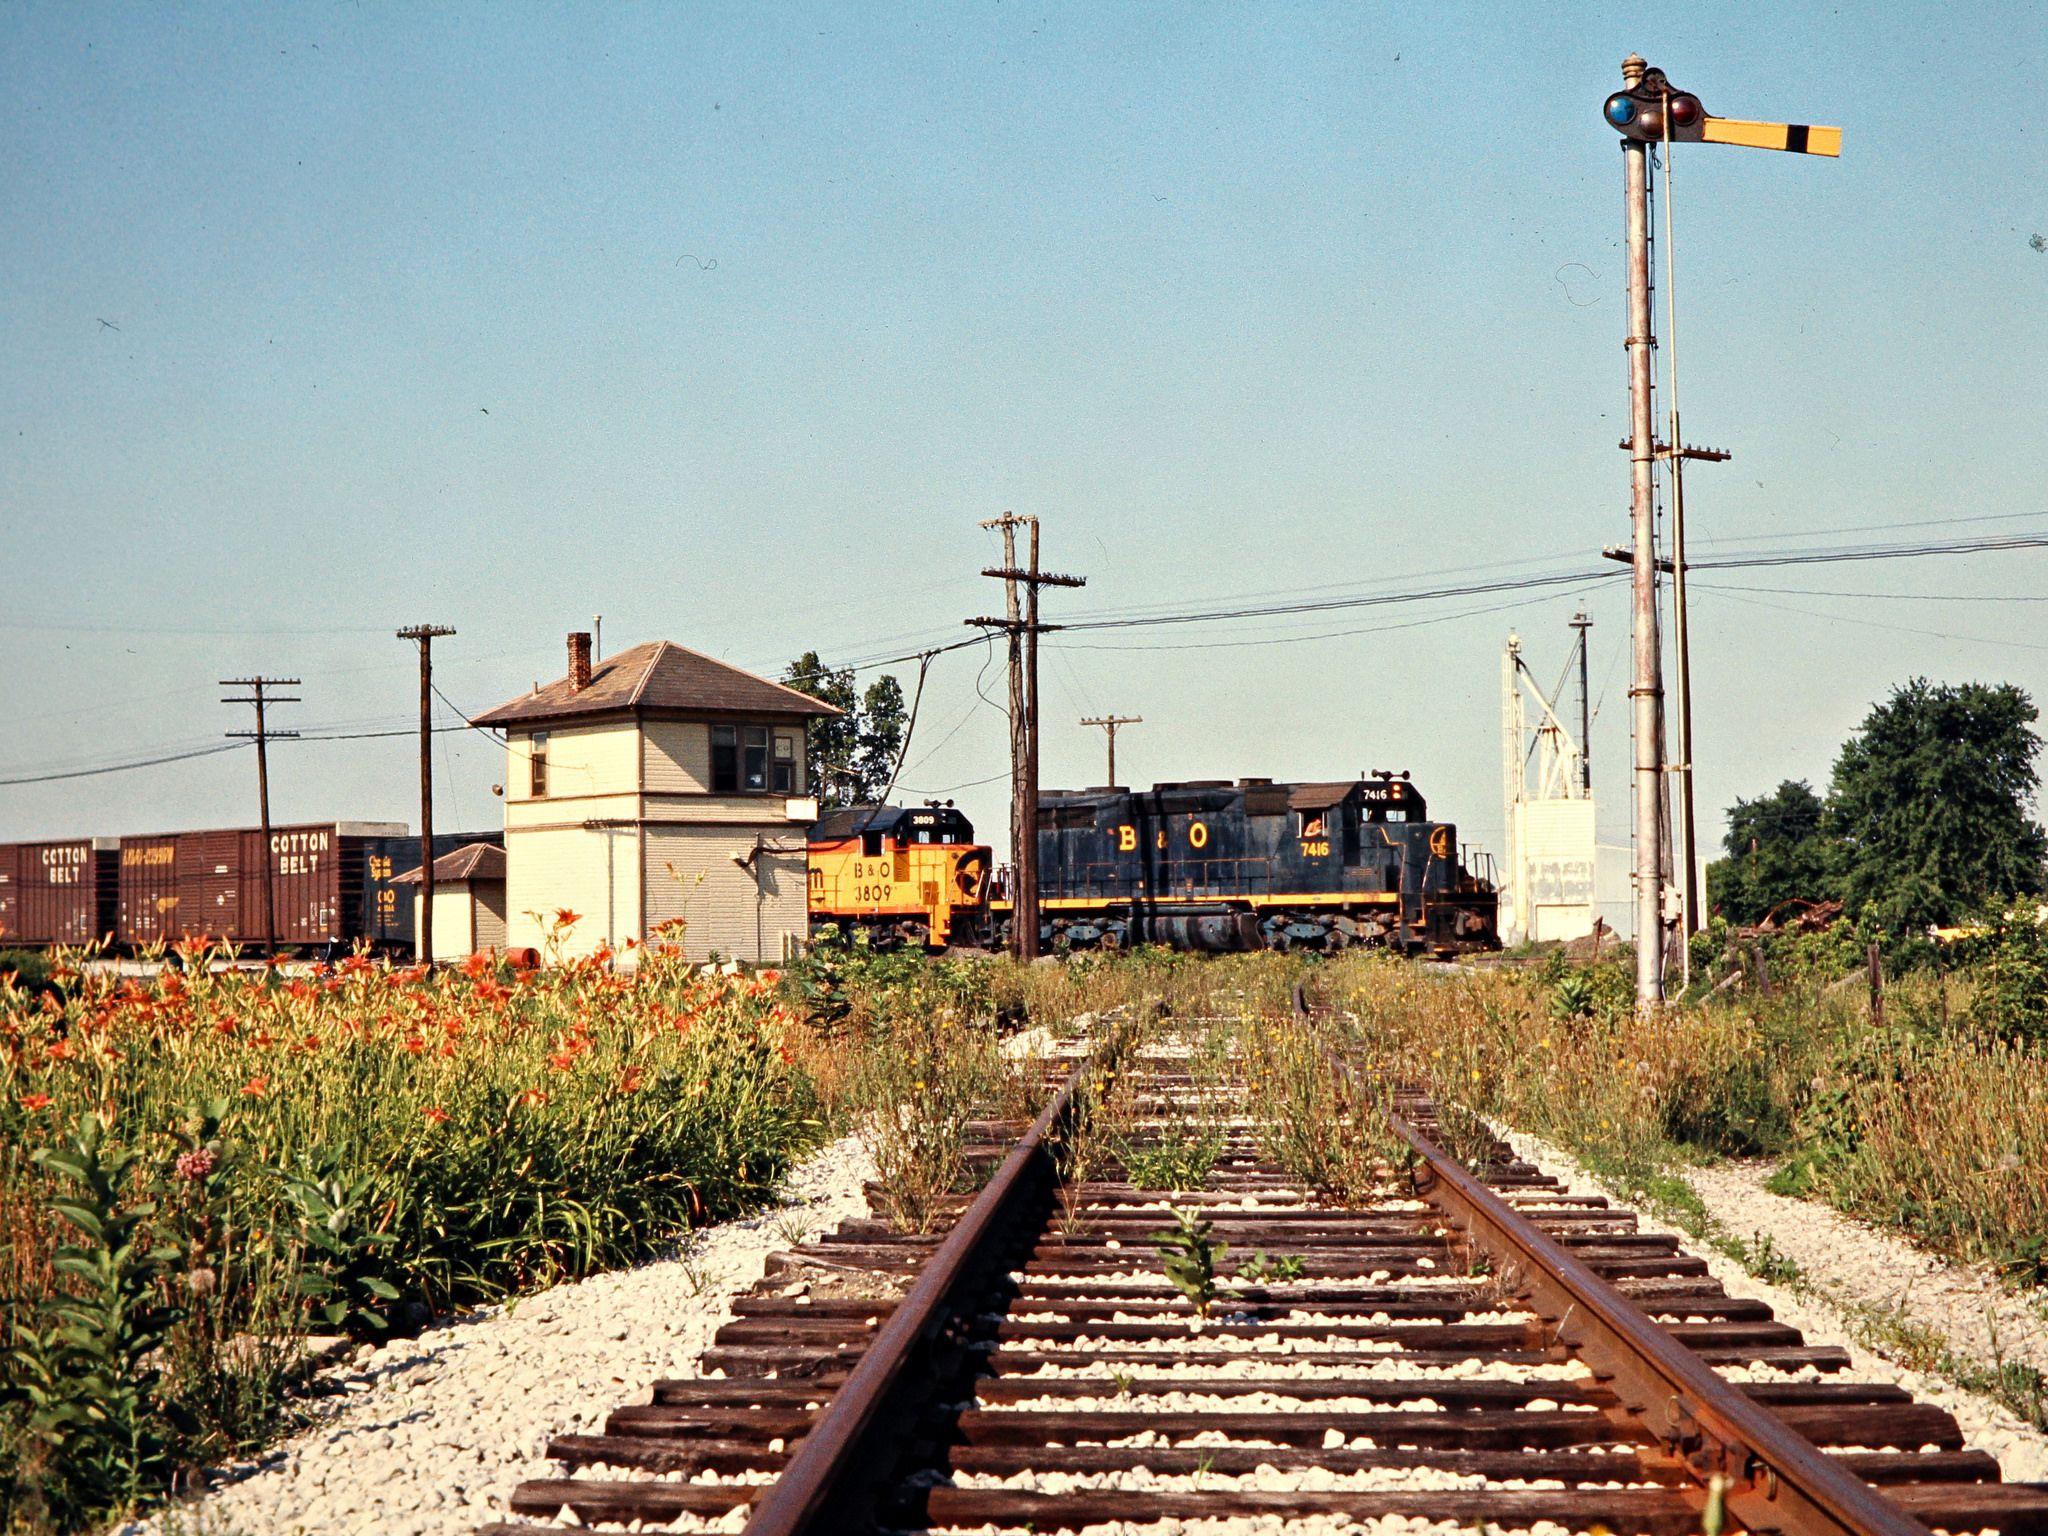 b o columbus grove ohio 1977 rail pinterest ohio rail train and train tracks. Black Bedroom Furniture Sets. Home Design Ideas